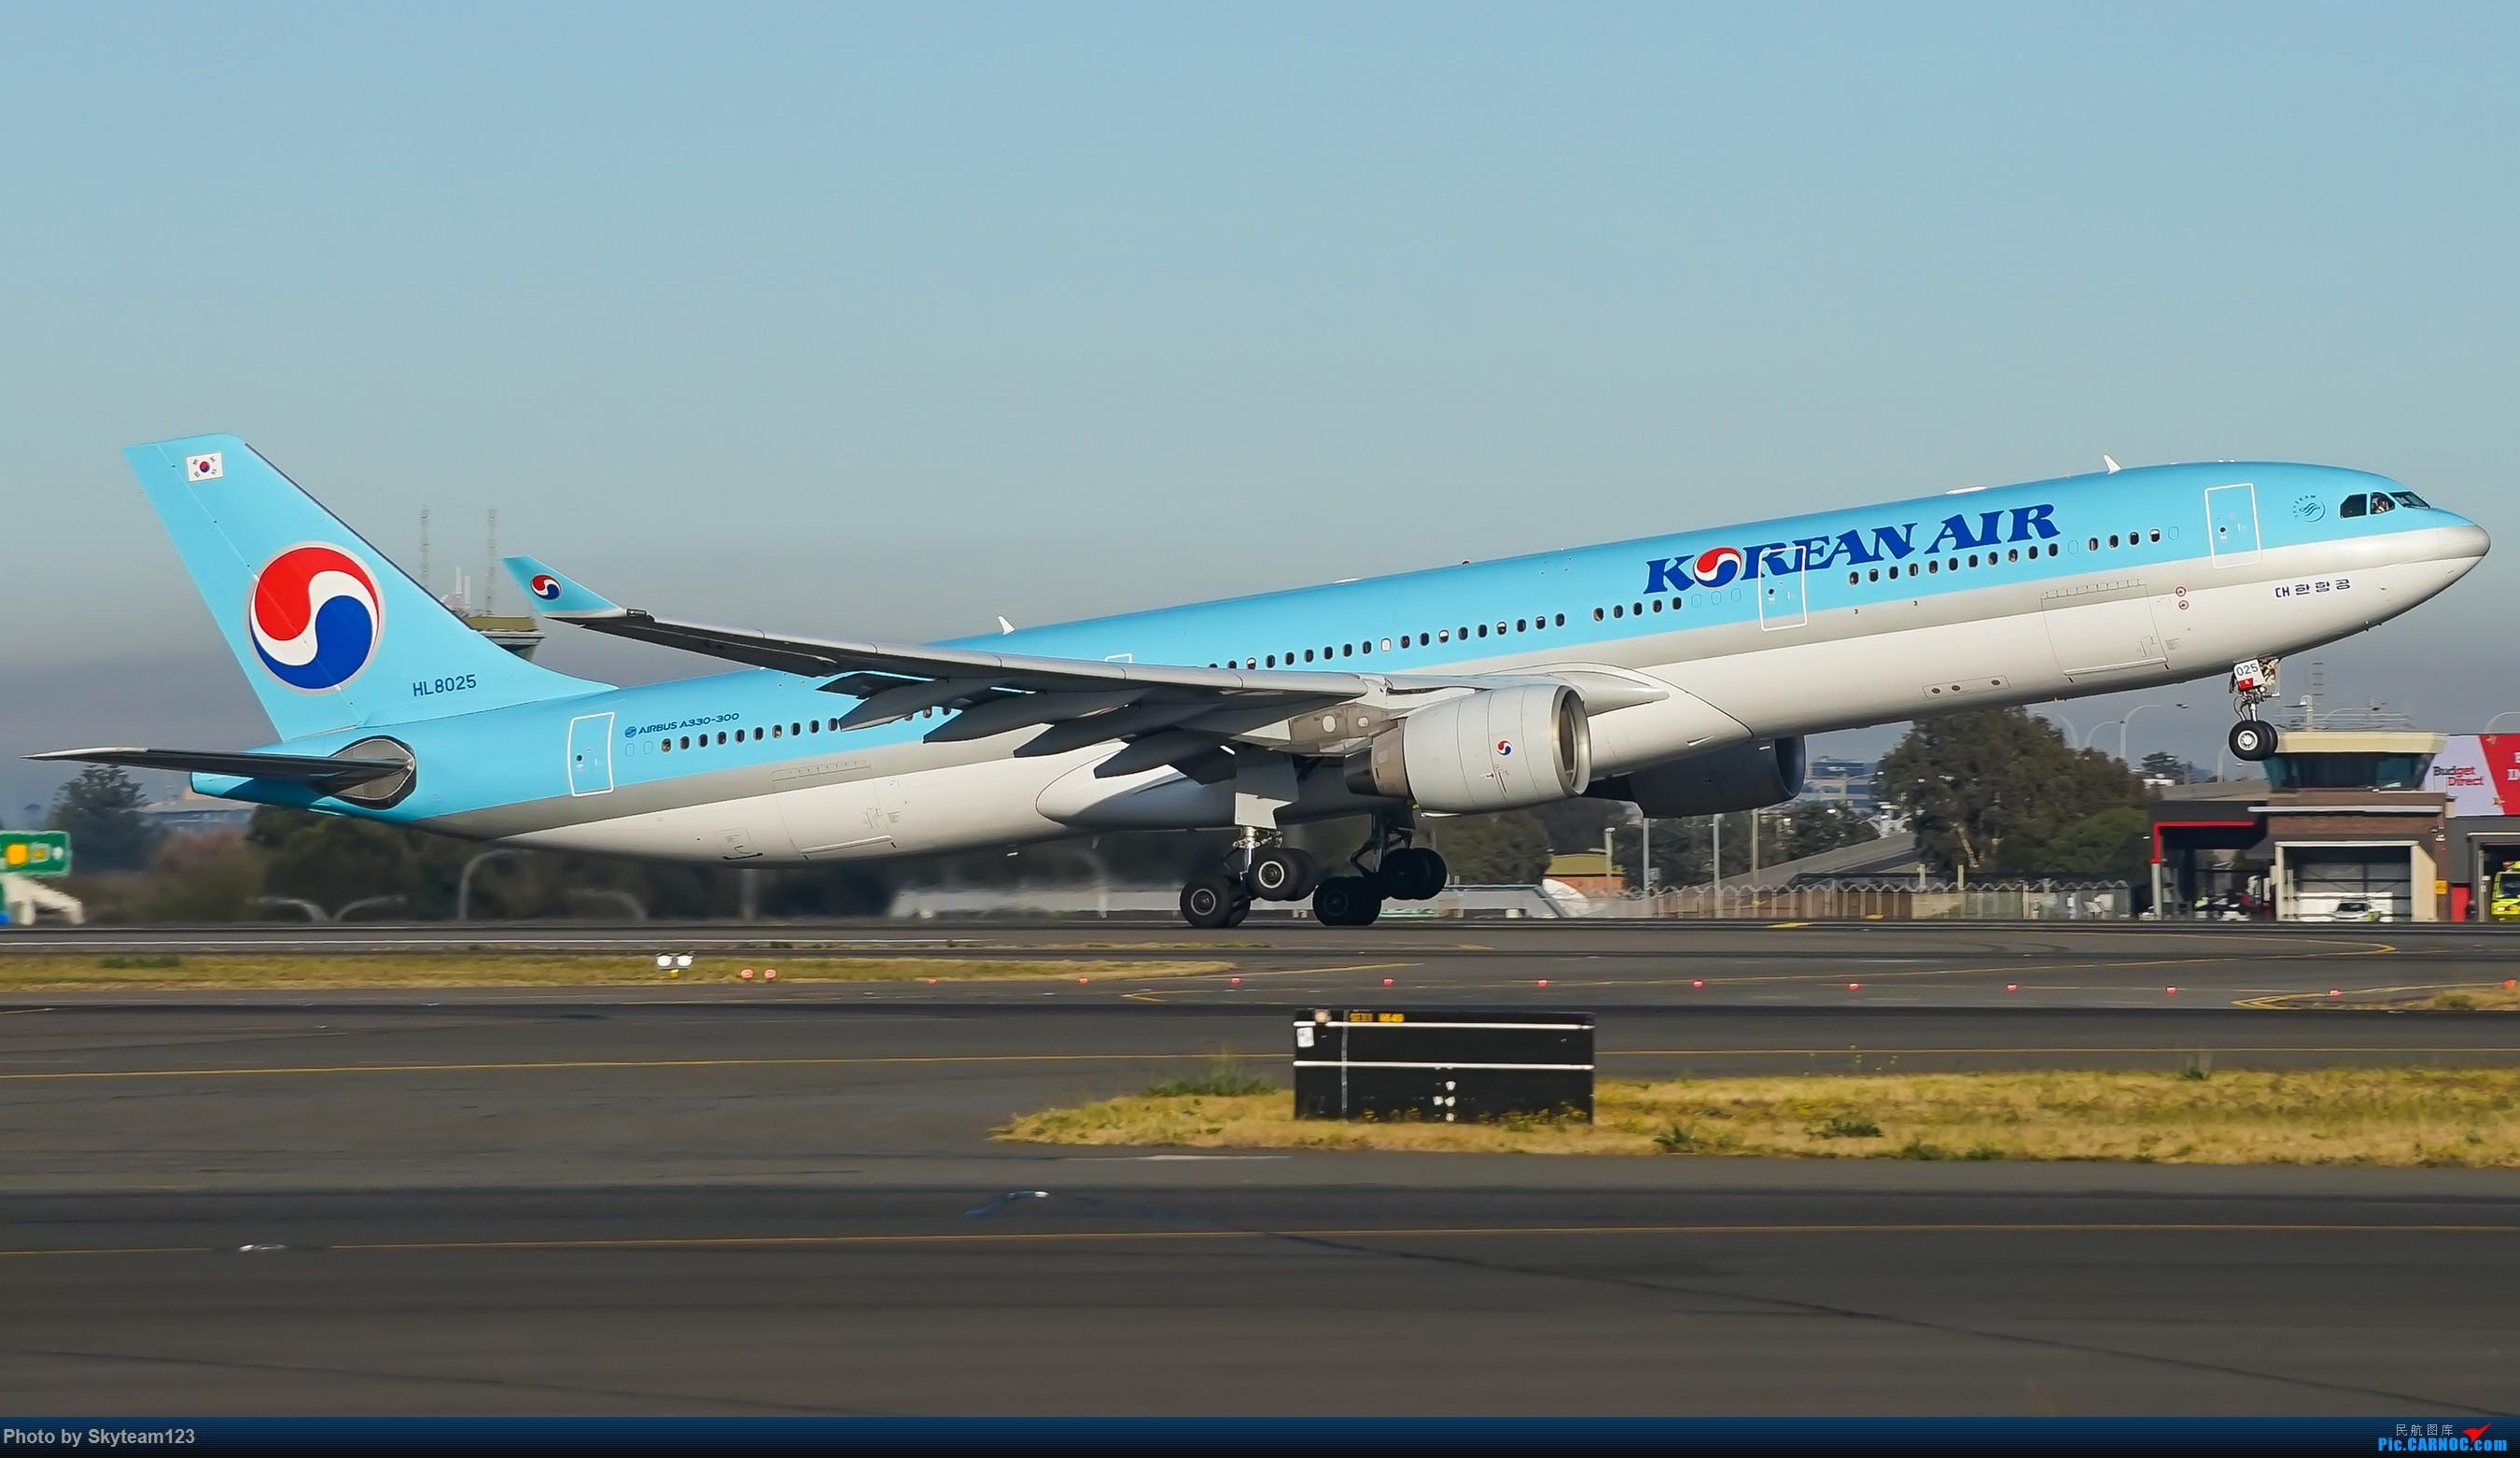 Re:[原创][SYD] 再访Blu EMU停车场 早上34L抵港出发杂图几张 AIRBUS A330-300 HL8025 澳大利亚悉尼金斯福德·史密斯机场